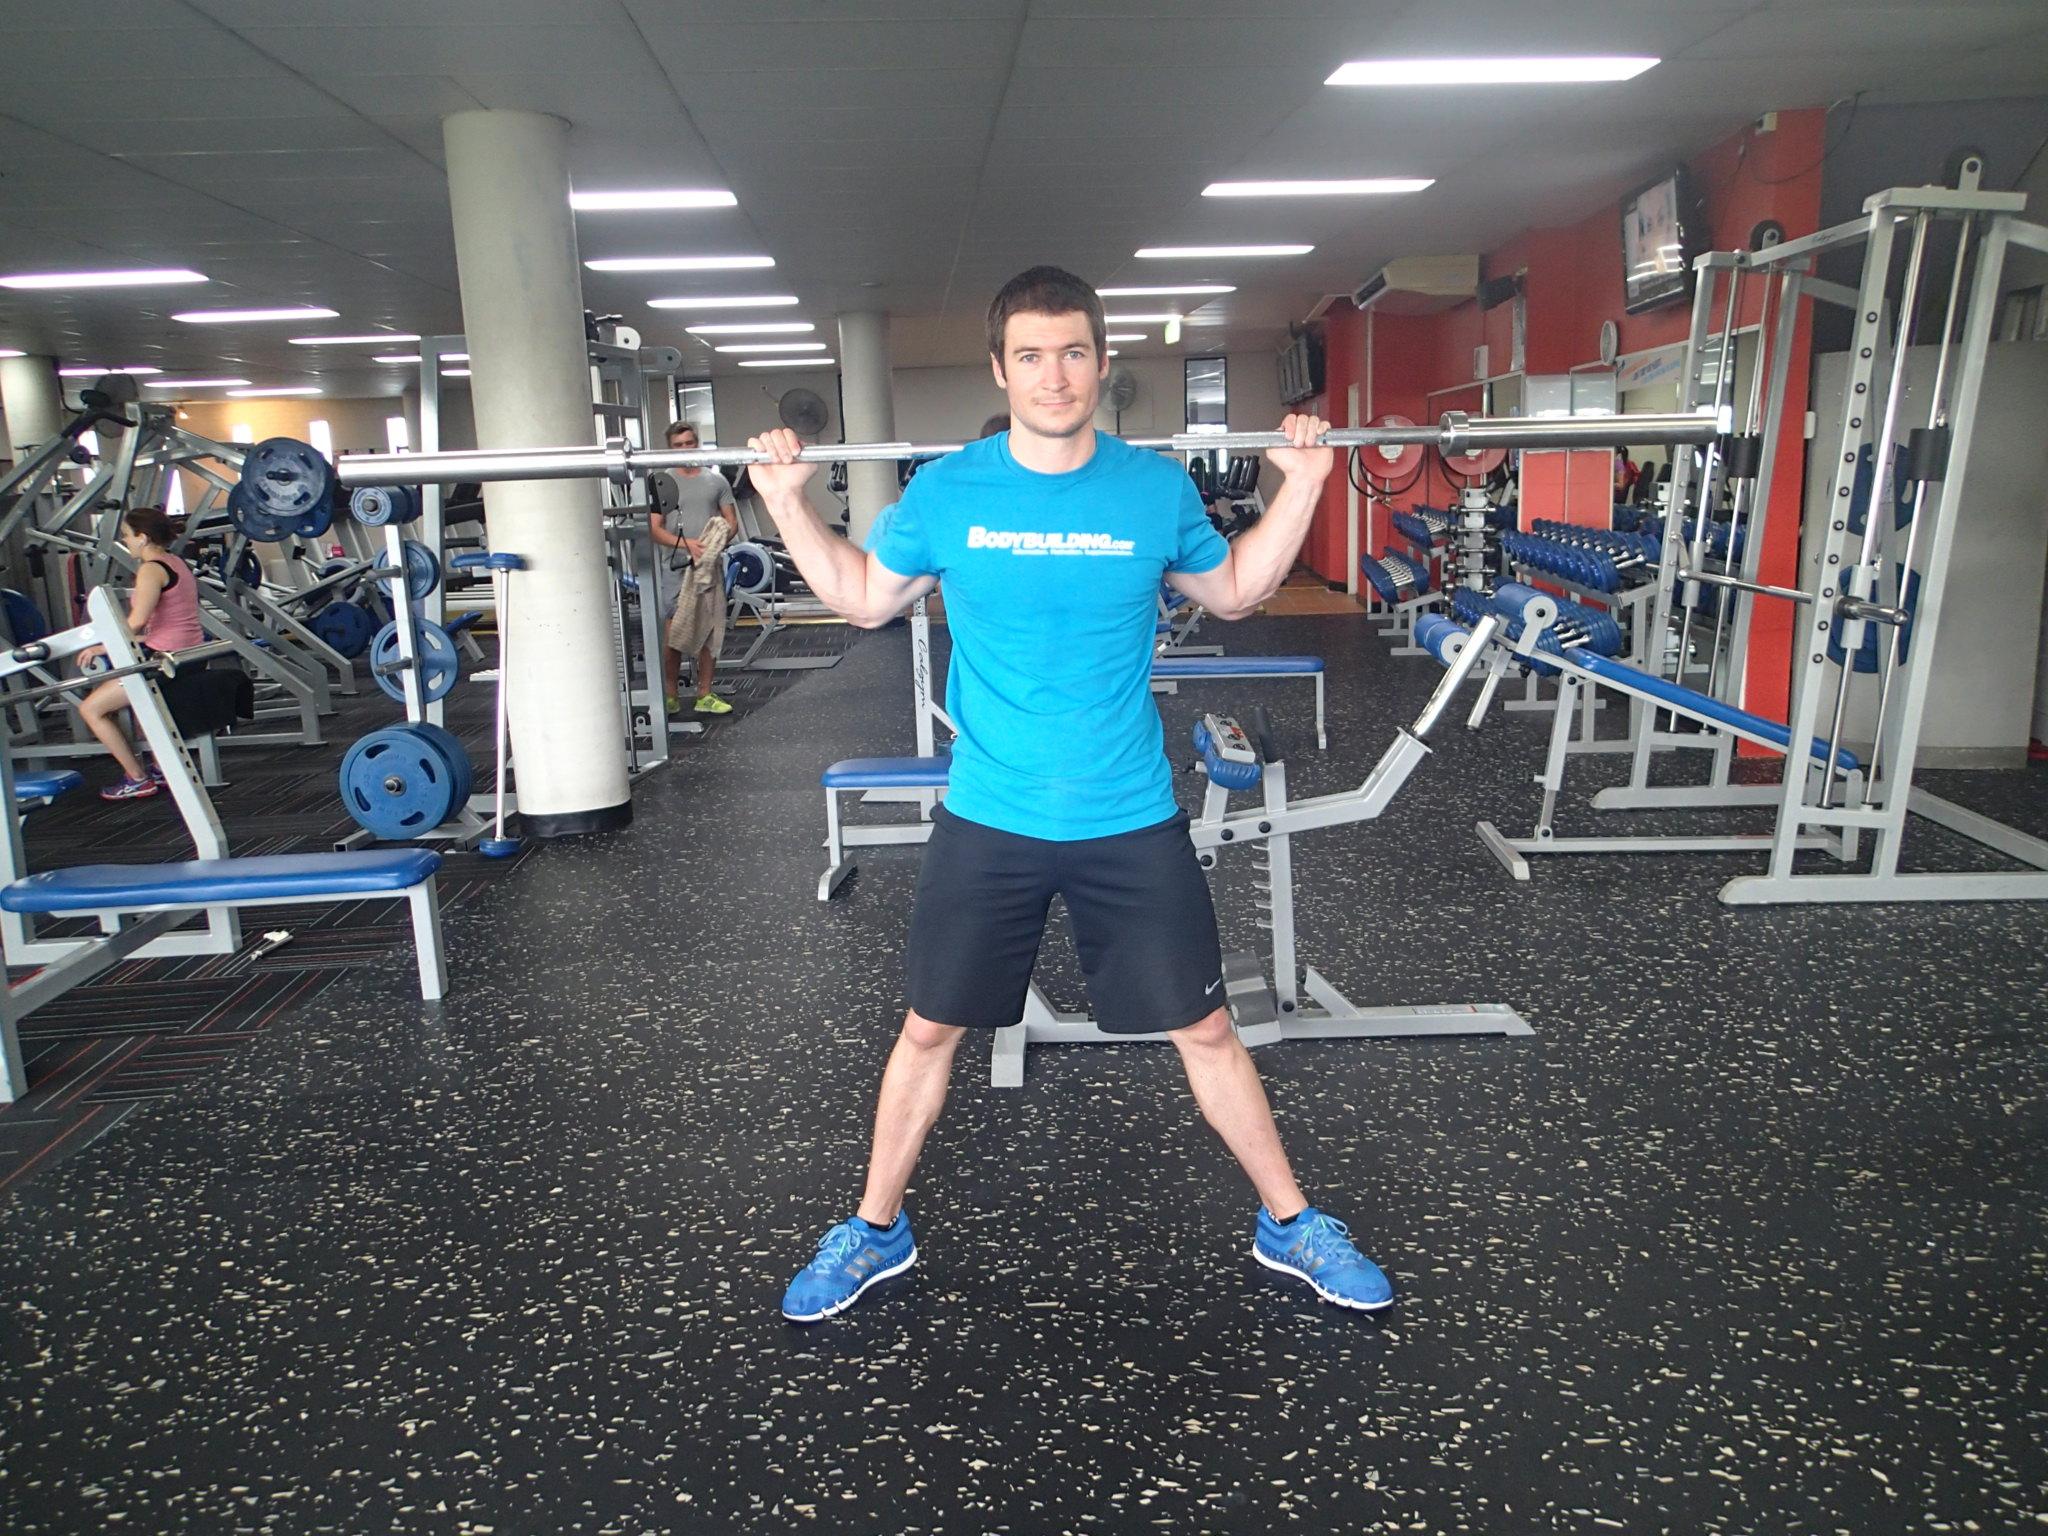 Squat - Wide stance